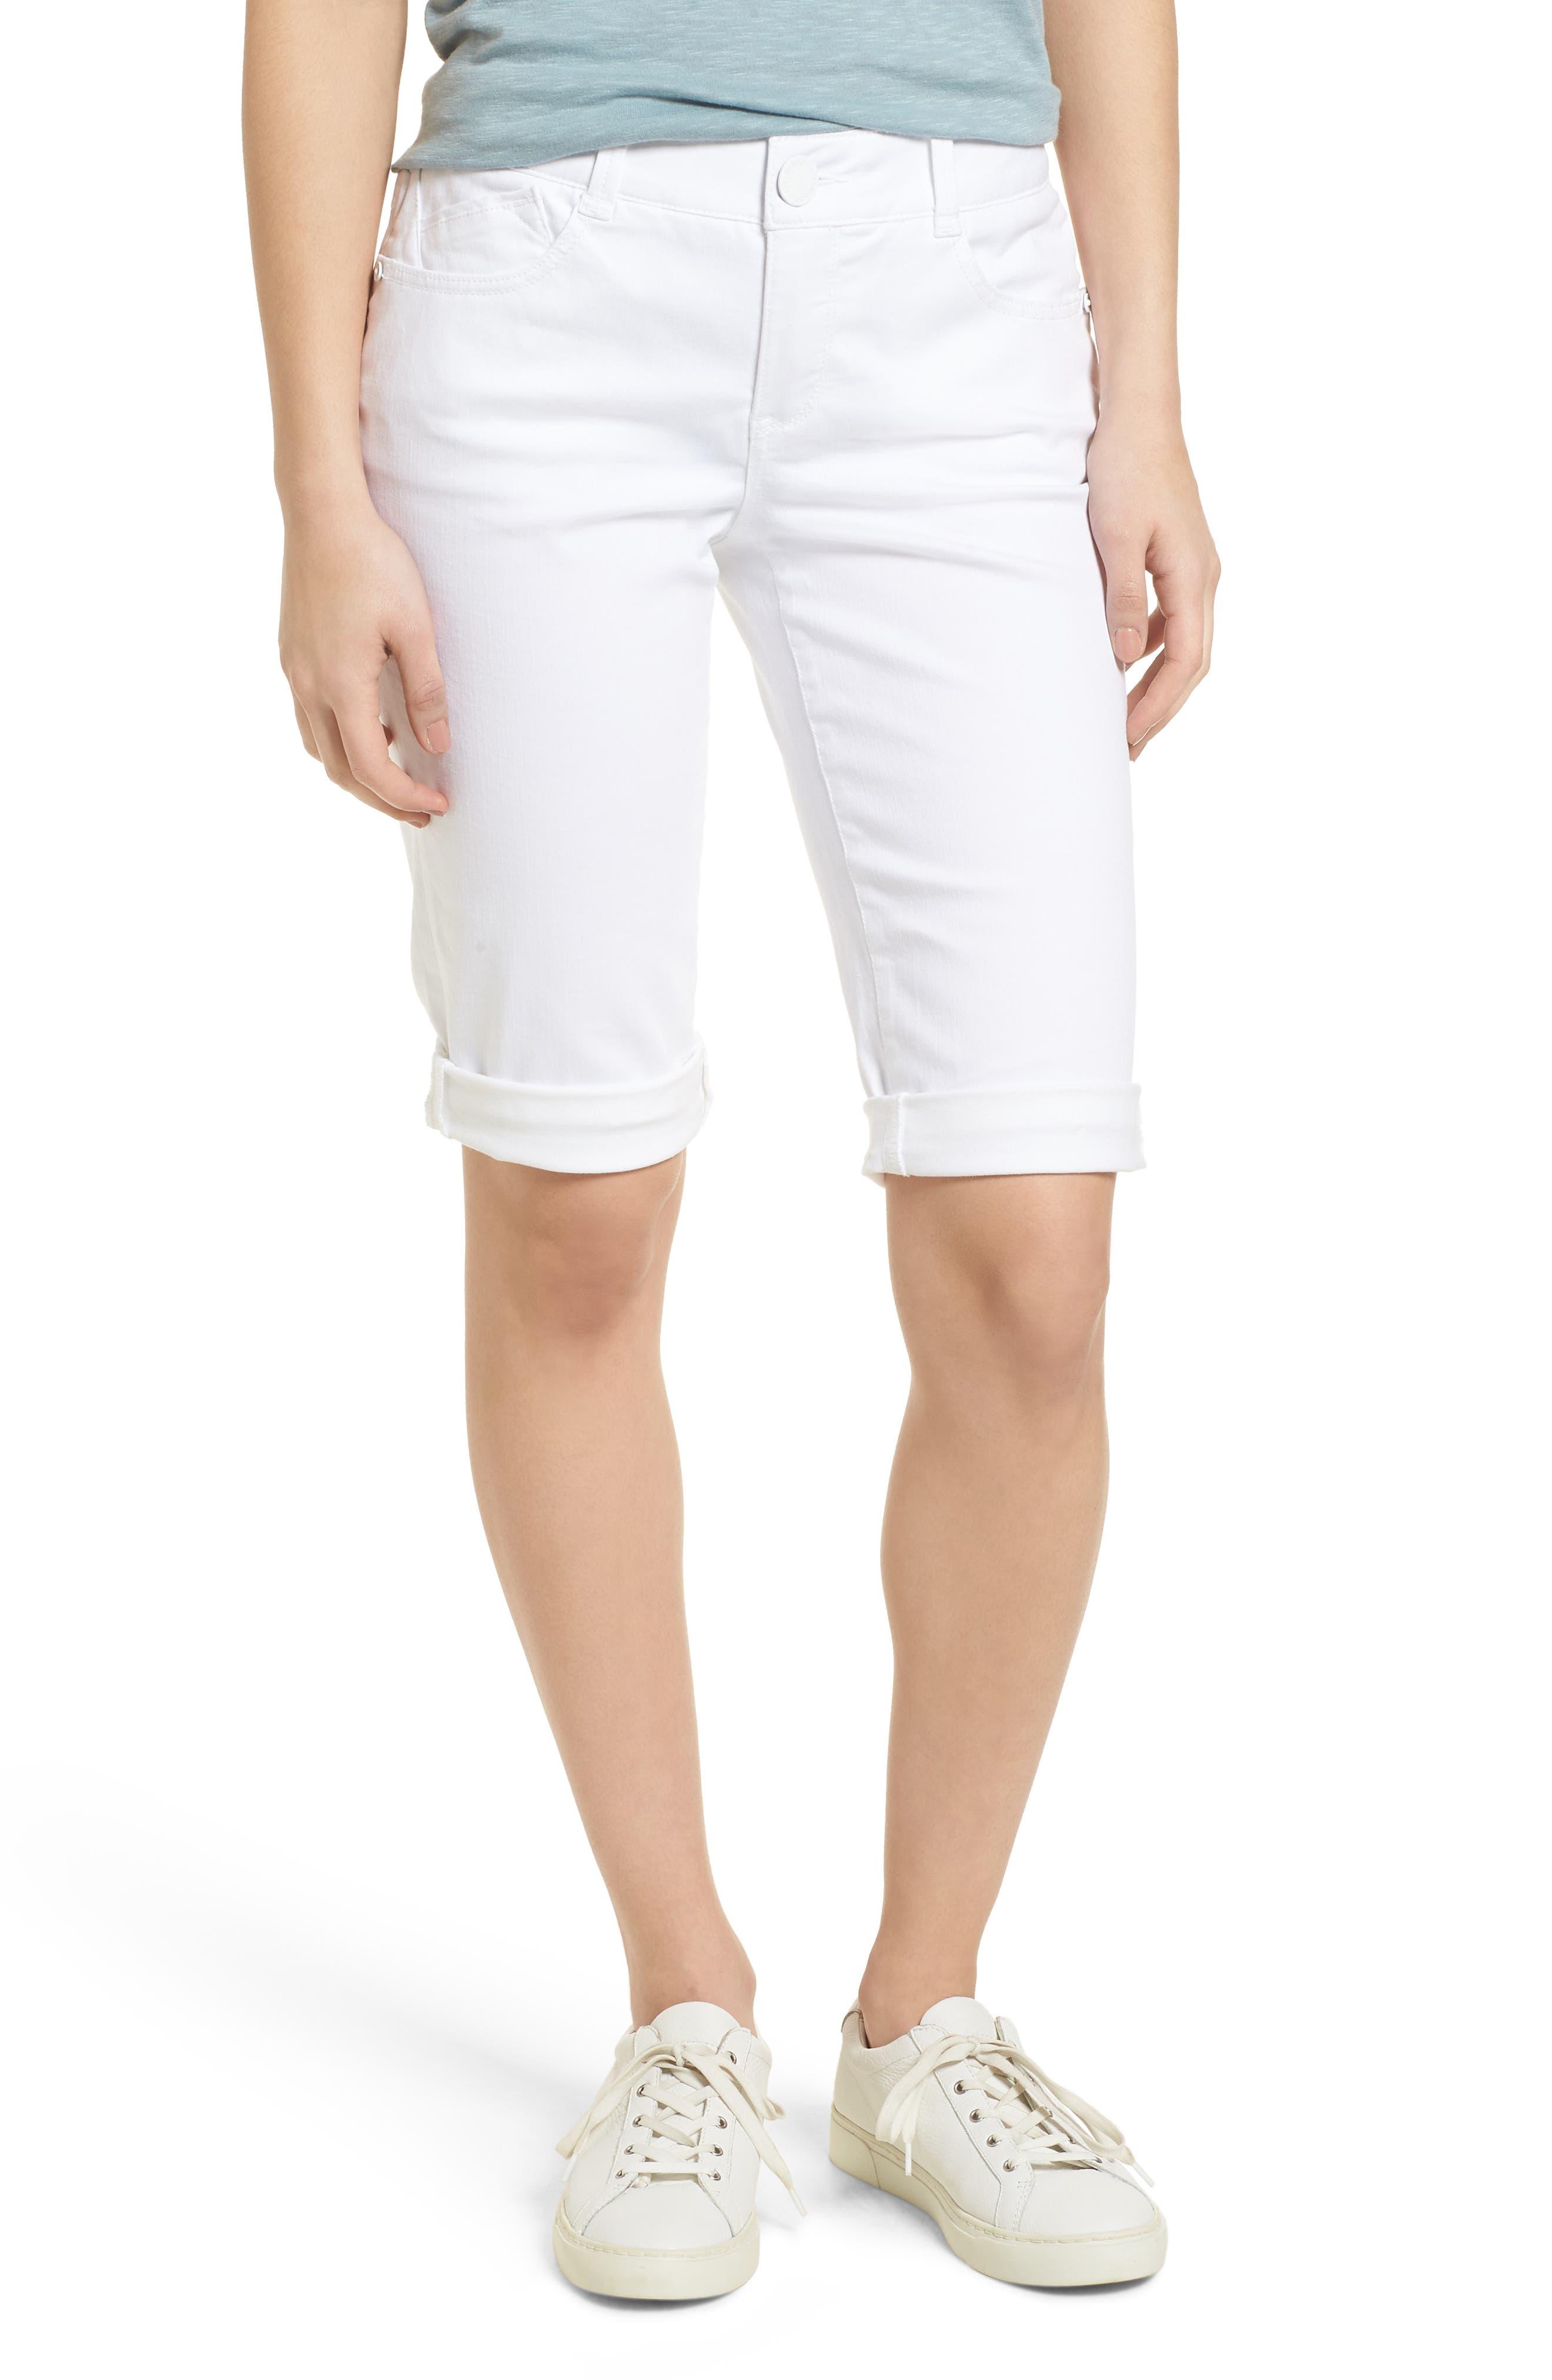 Ab-solution White Bermuda Shorts,                             Main thumbnail 1, color,                             106